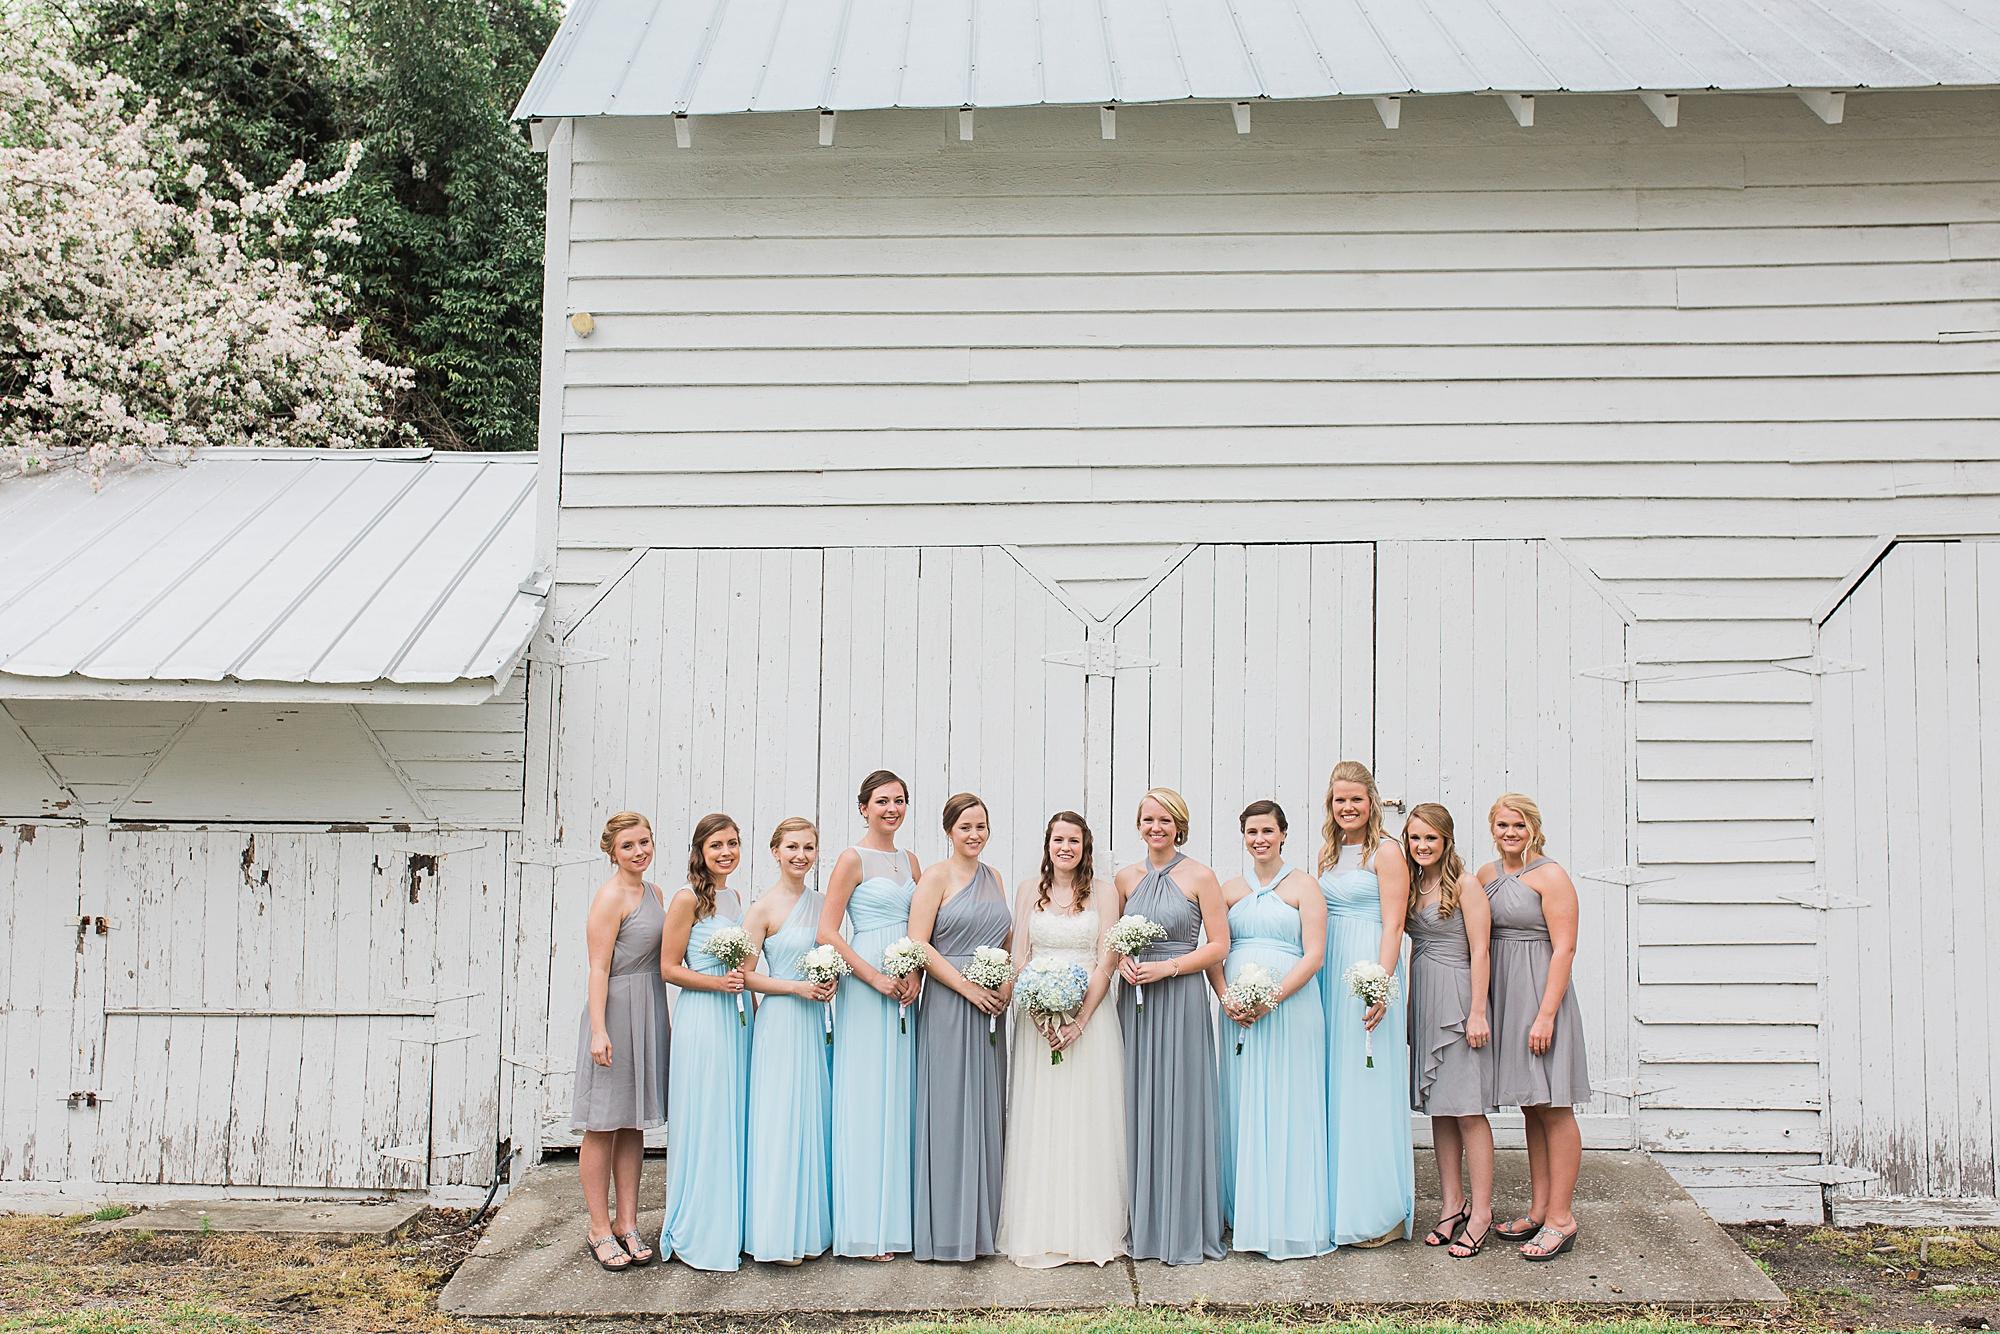 Blue and grey bridesmaid dresses